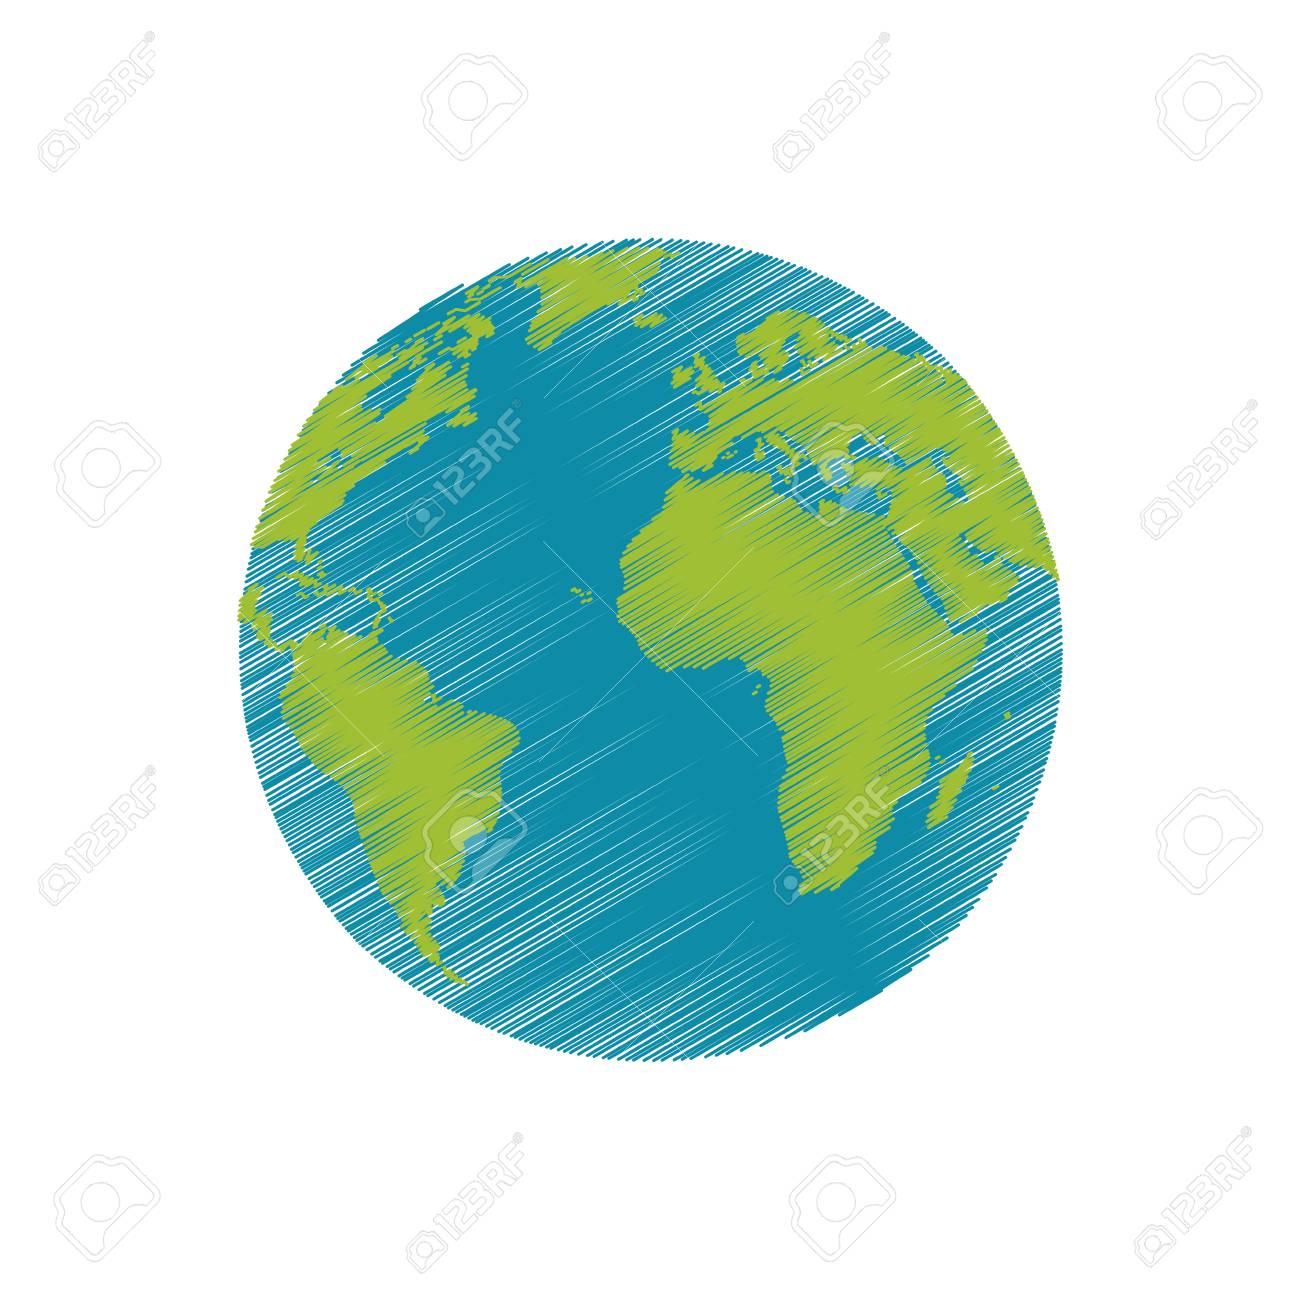 Dessin De La Terre avec Image De La Terre Dessin